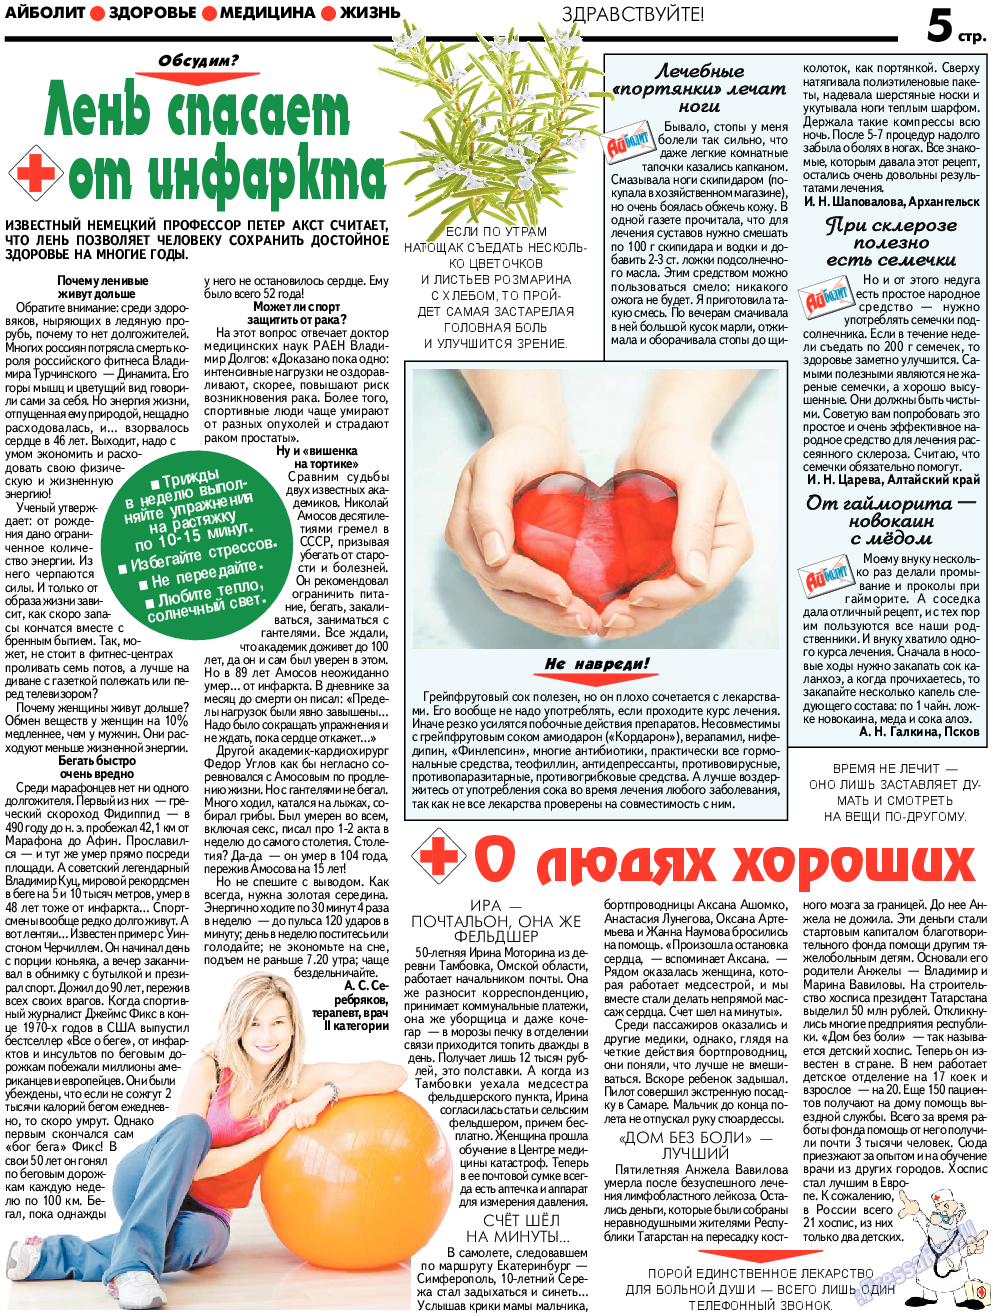 АйБолит (газета). 2018 год, номер 6, стр. 5